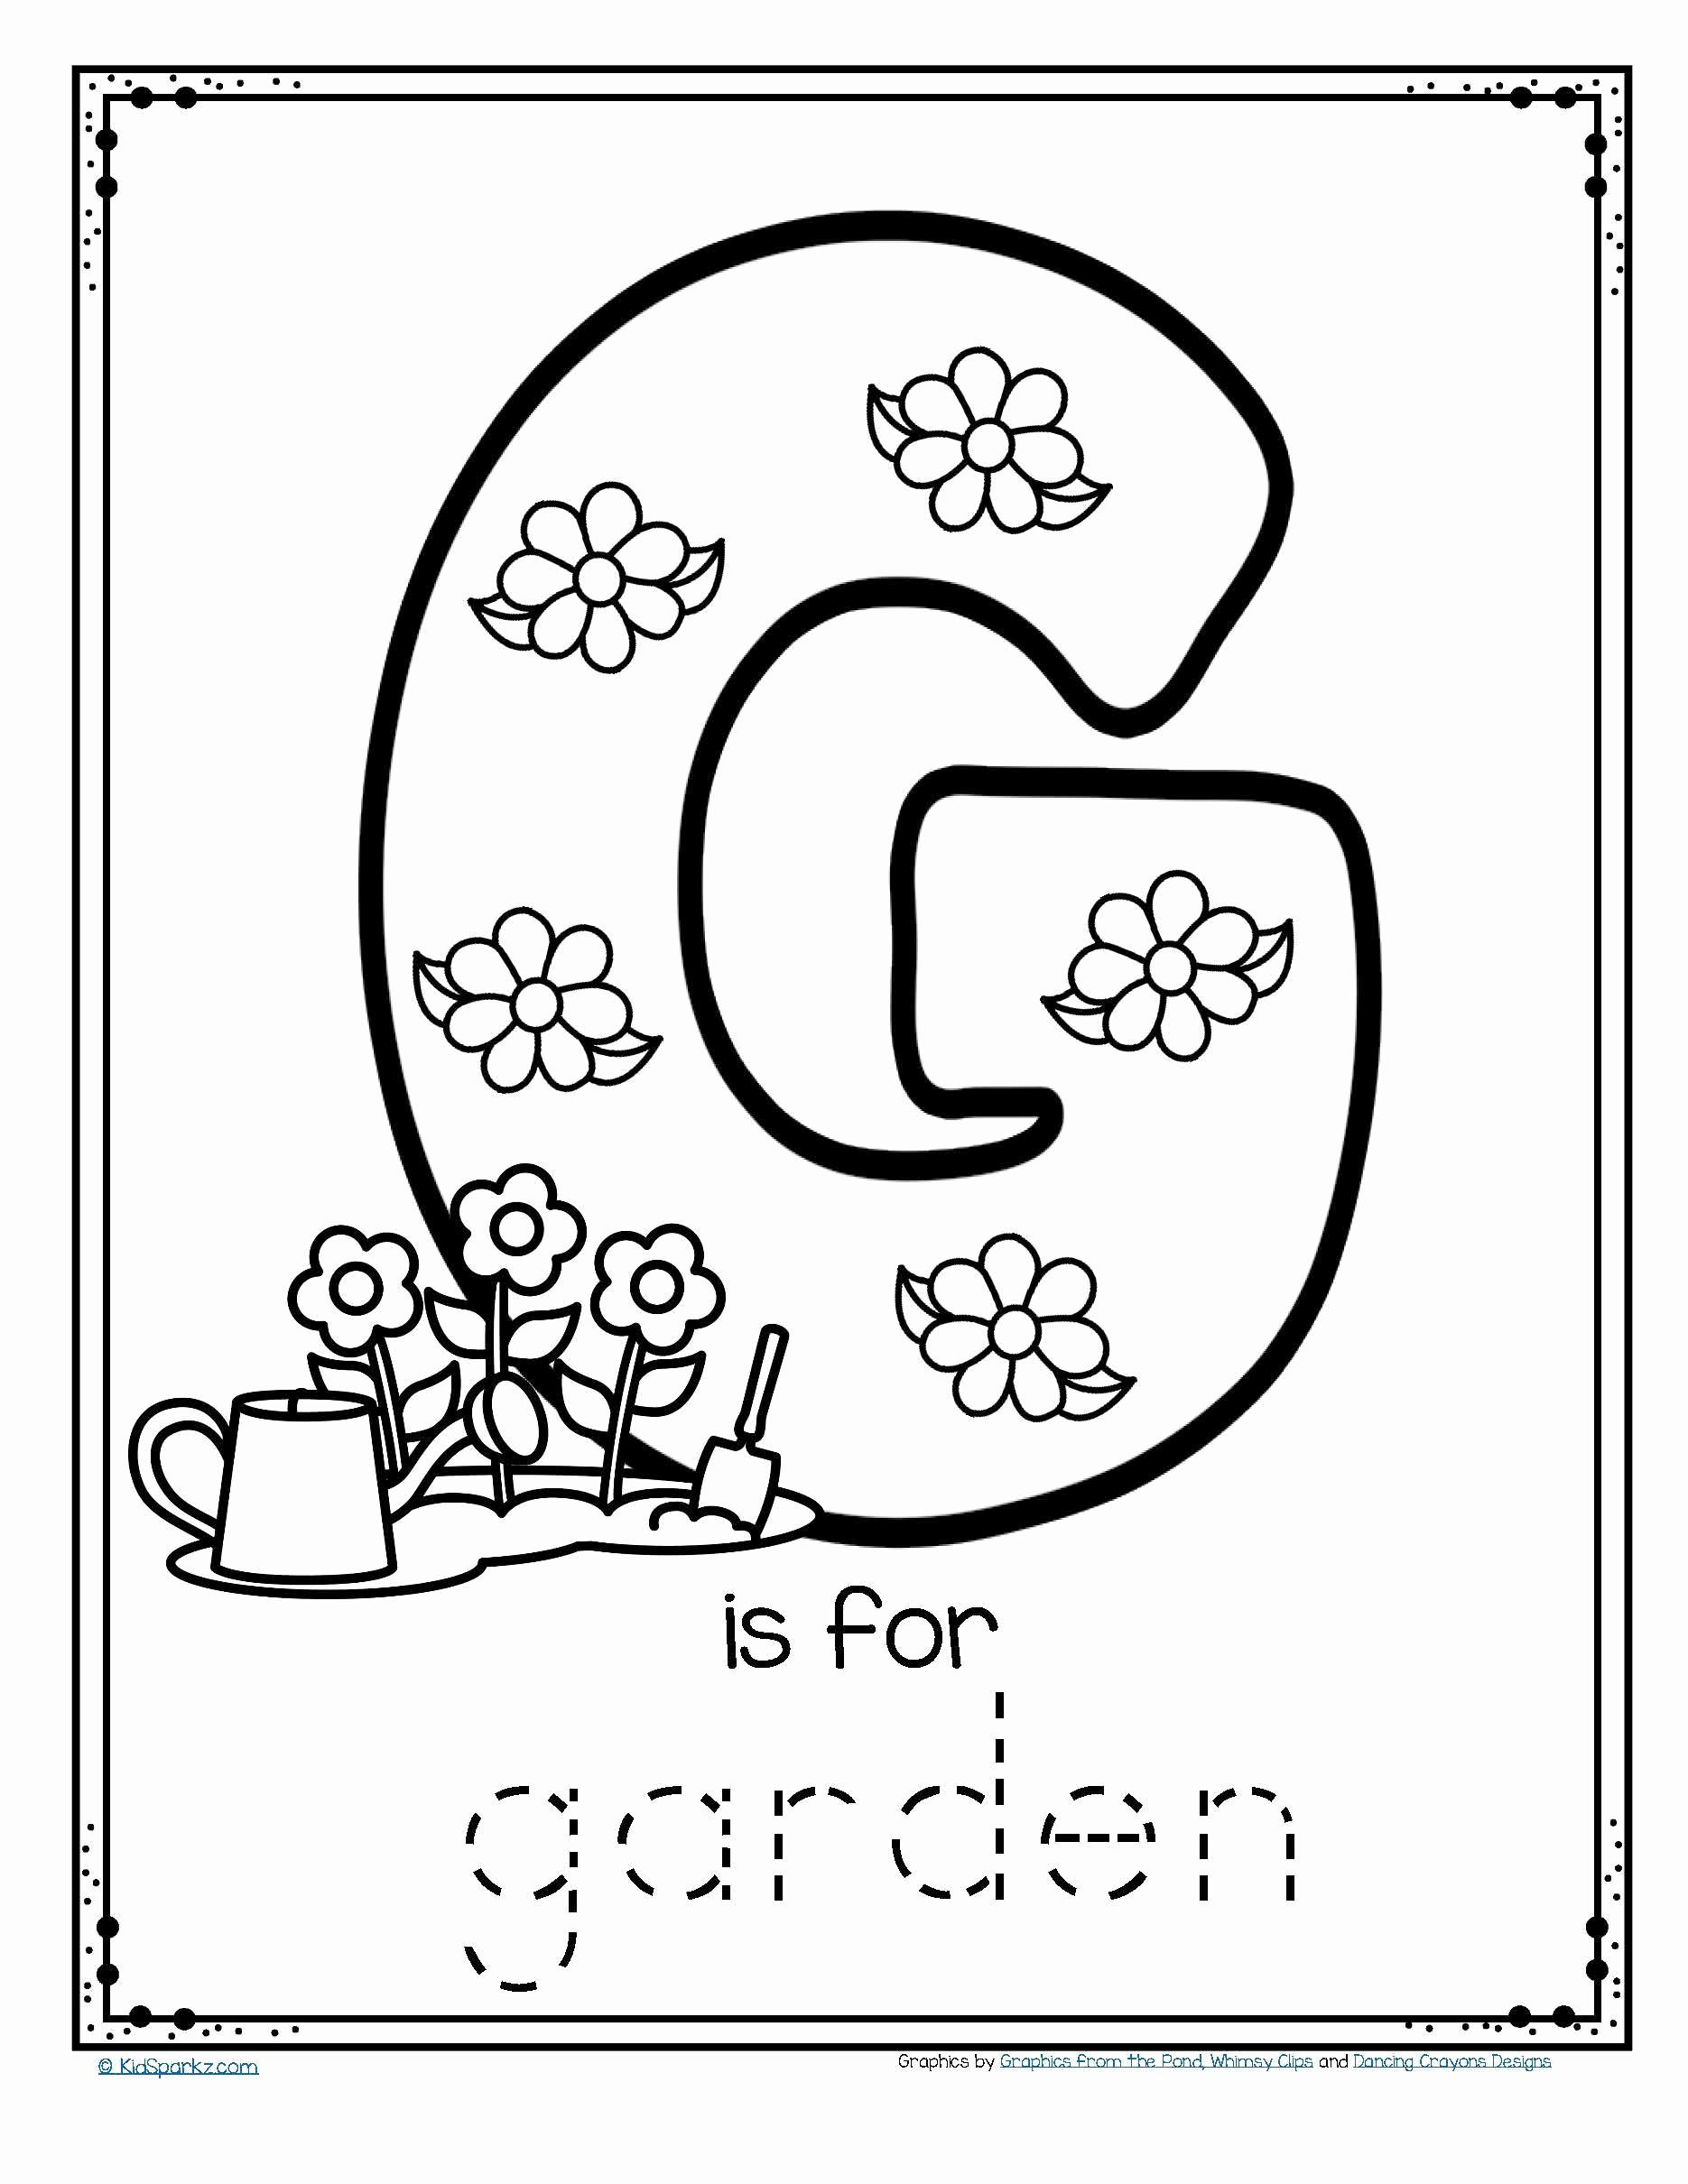 G Worksheets for Preschool Elegant Free G is for Garden Trace and Color Fine Motor Printable